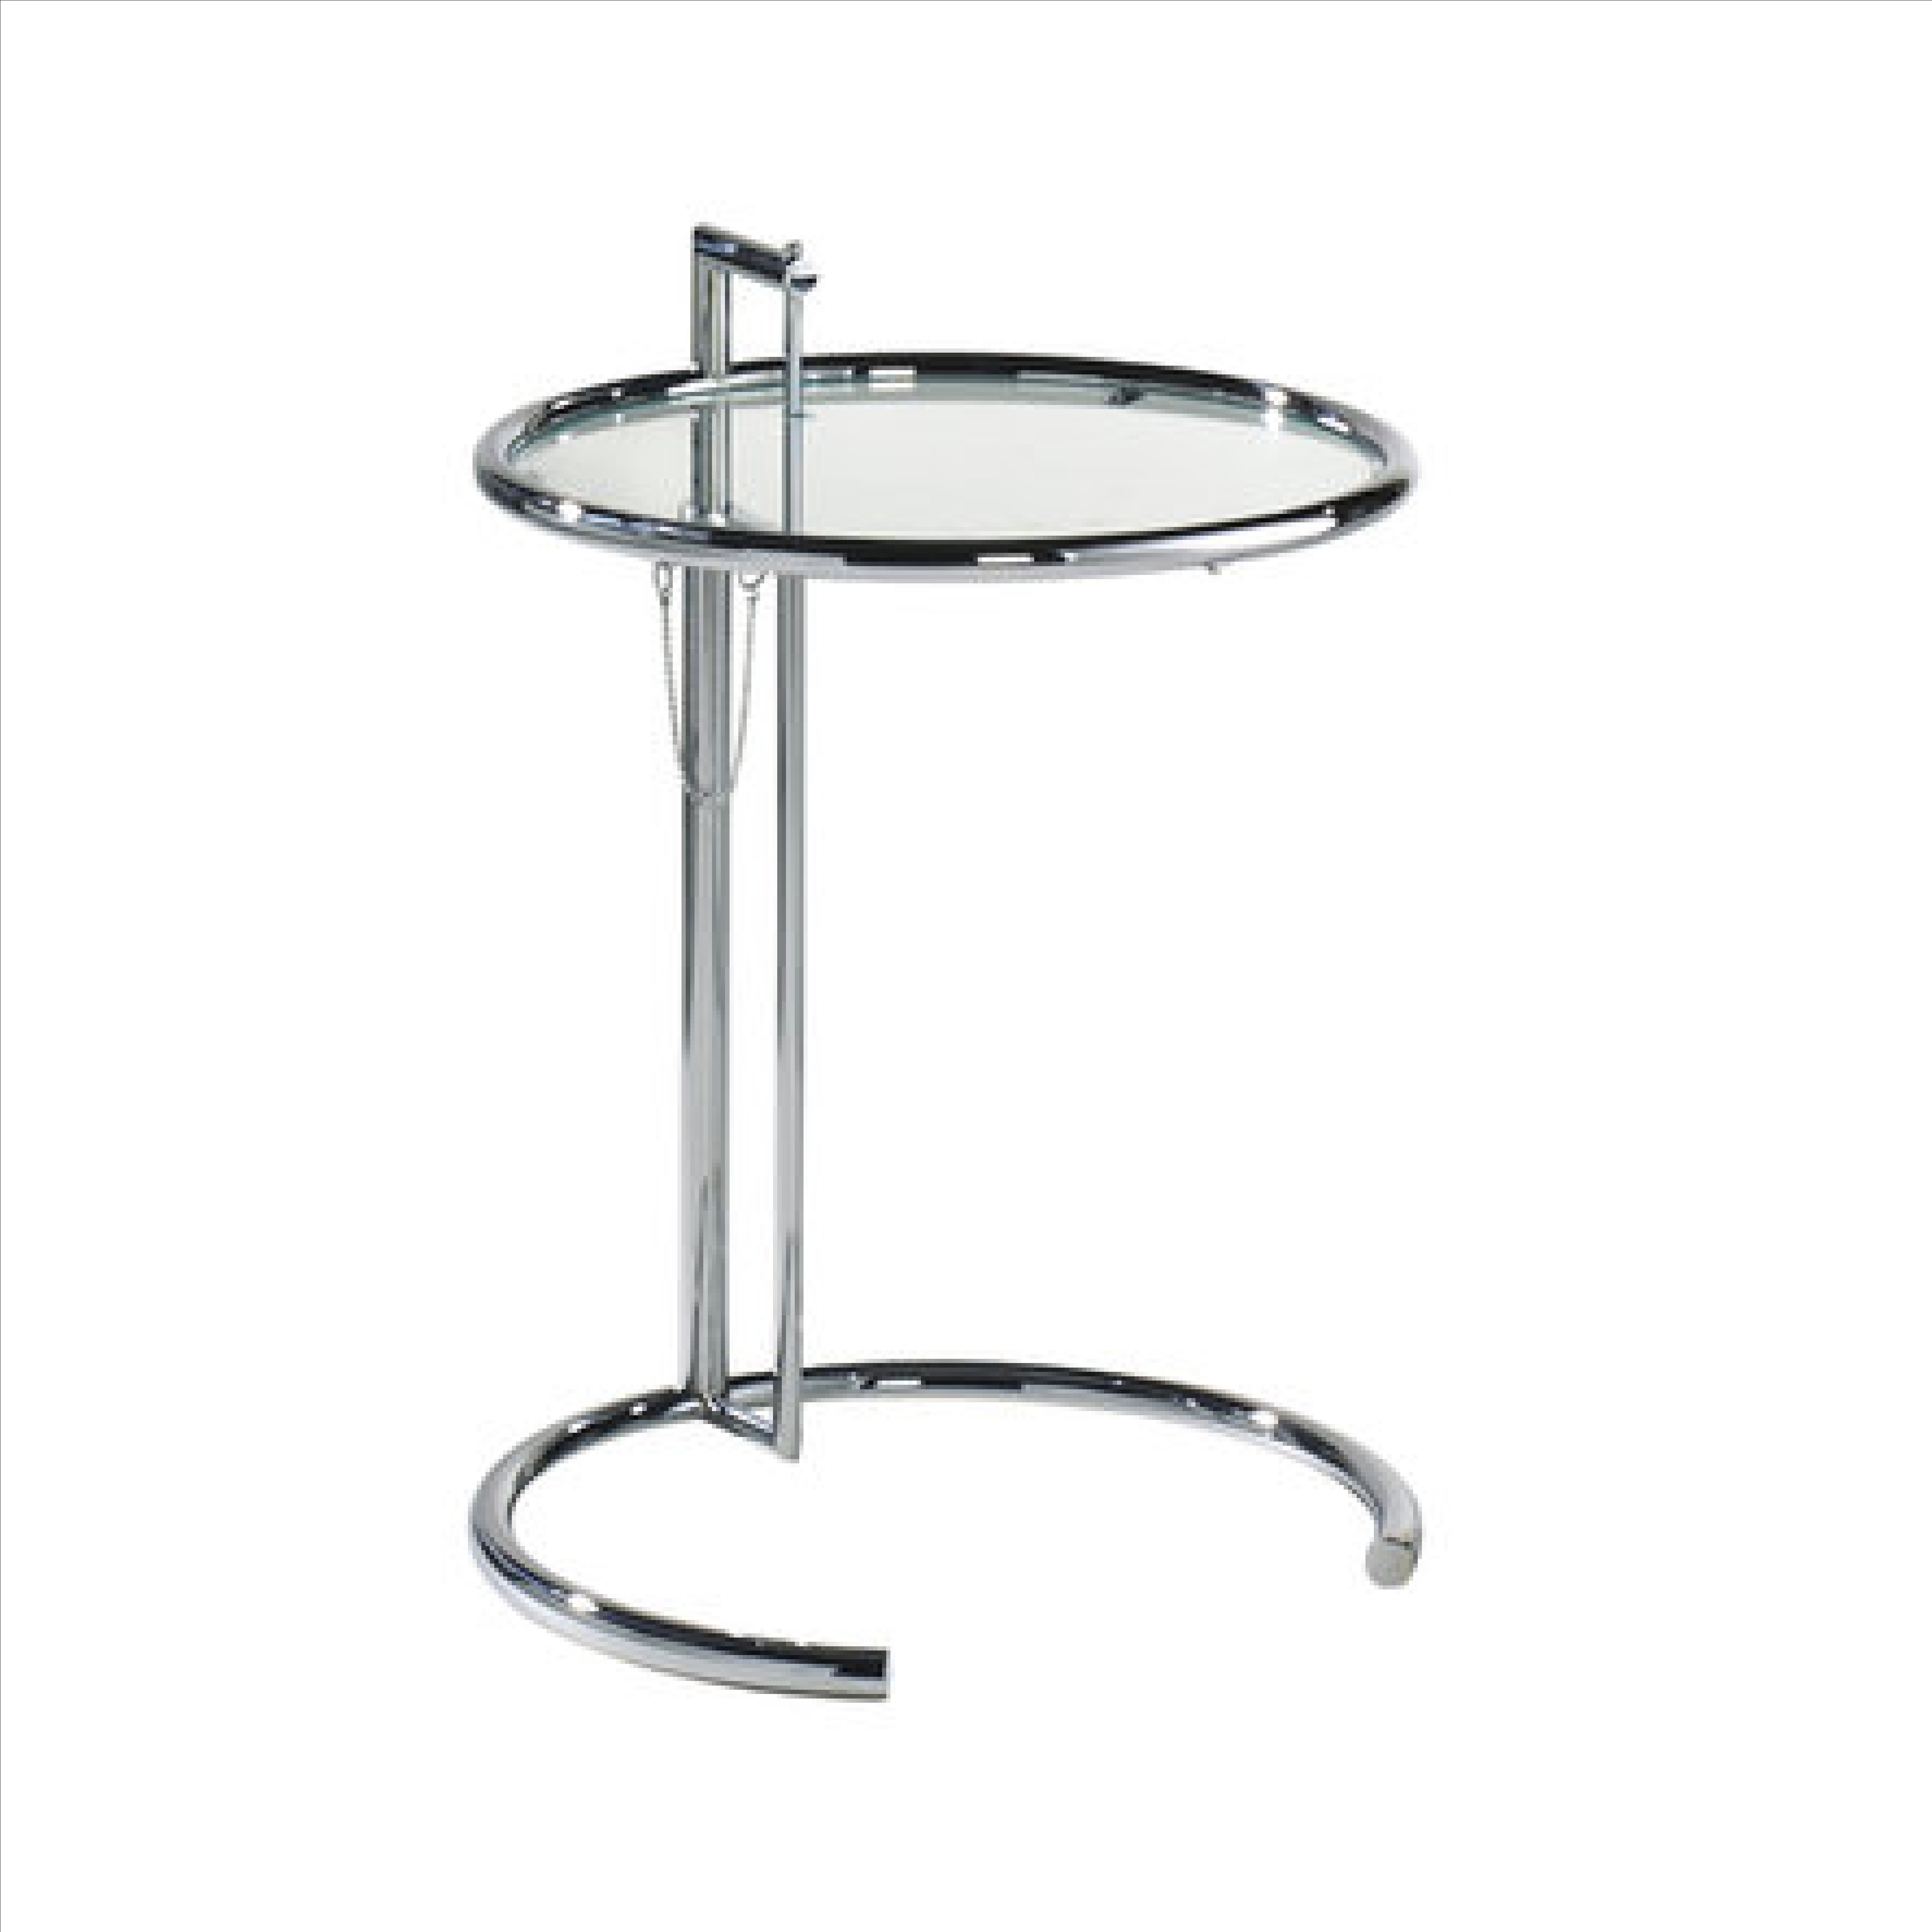 classicon adjustable table e 1027 eileen gray 1927 luxor classics. Black Bedroom Furniture Sets. Home Design Ideas